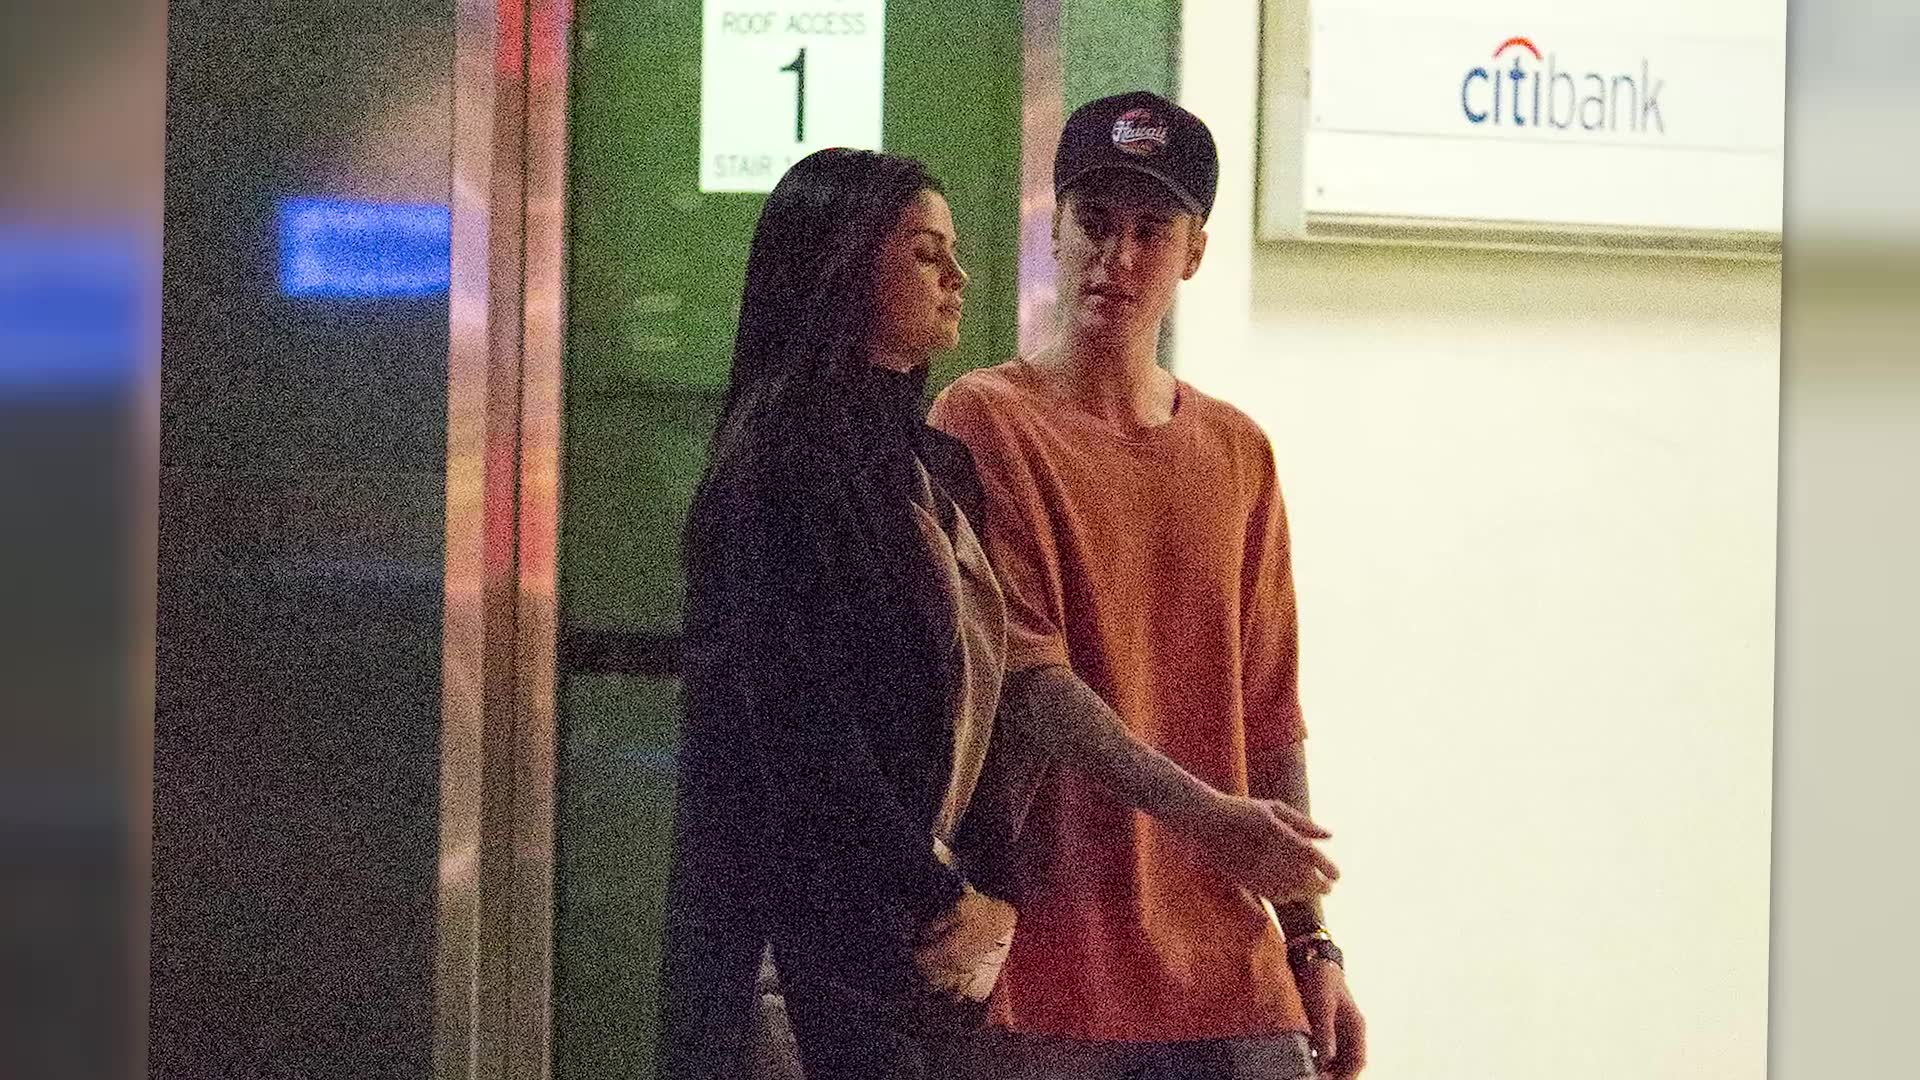 Justin Bieber and Selena Gomez Reunite in Beverly Hills